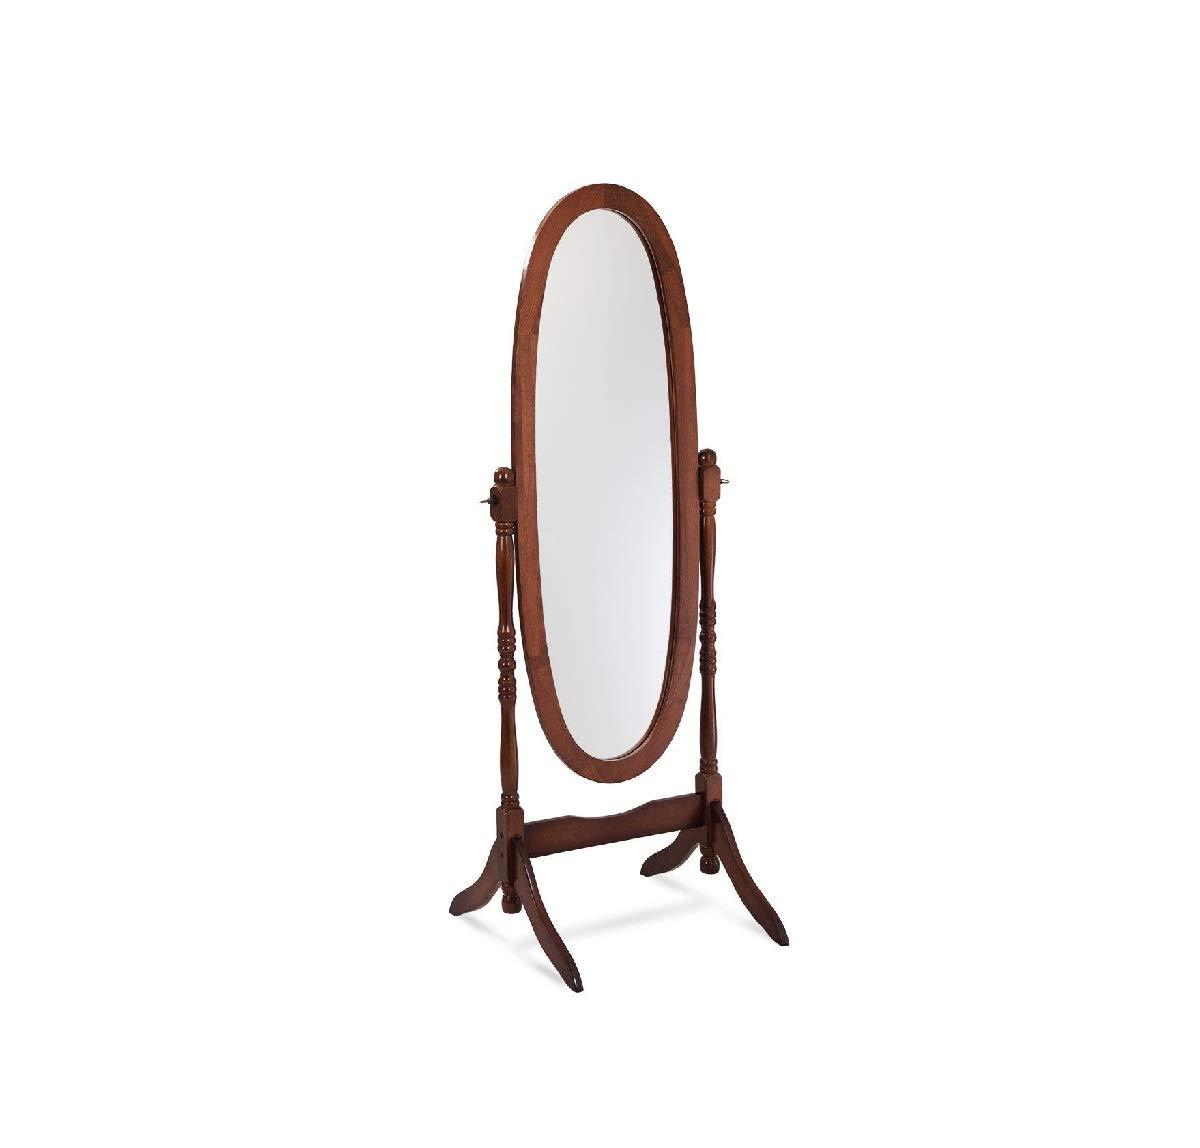 Daisy Days Full Length Cheval Floor Mirror Wooden Standing Dressing Free Swivel Brown